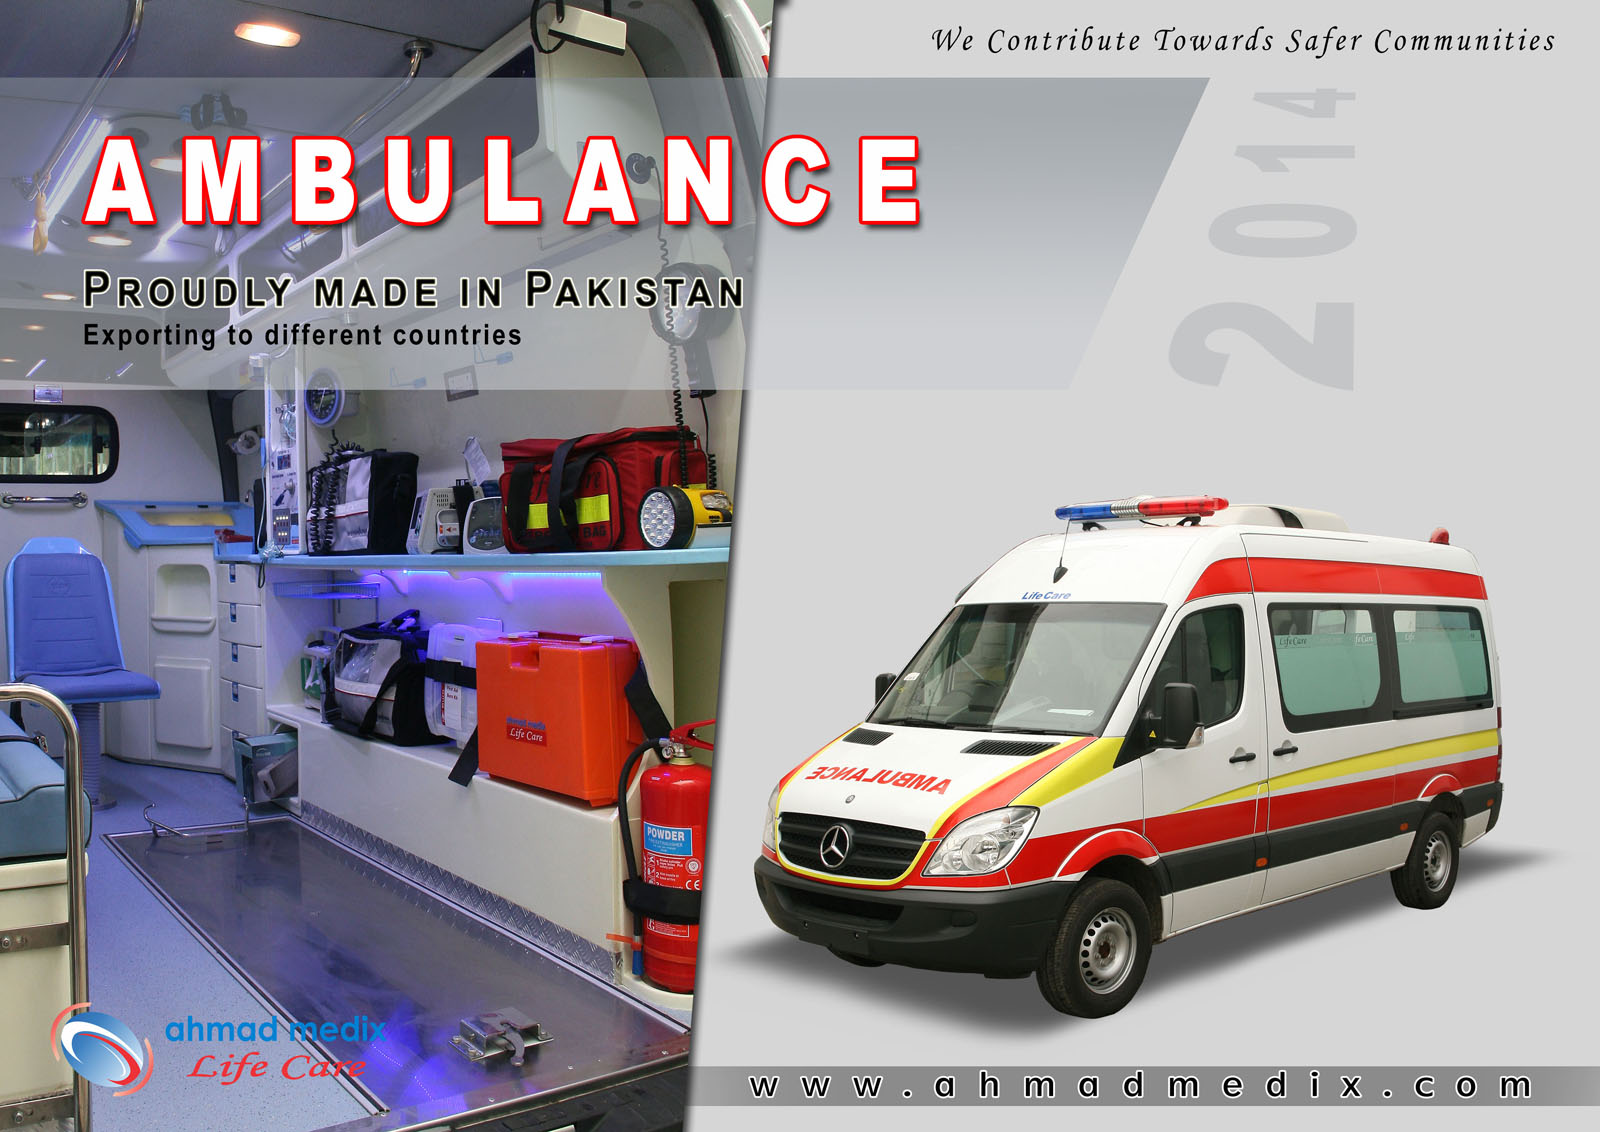 Ahmad Medix (Life Care): Ambulance Internal Veiw